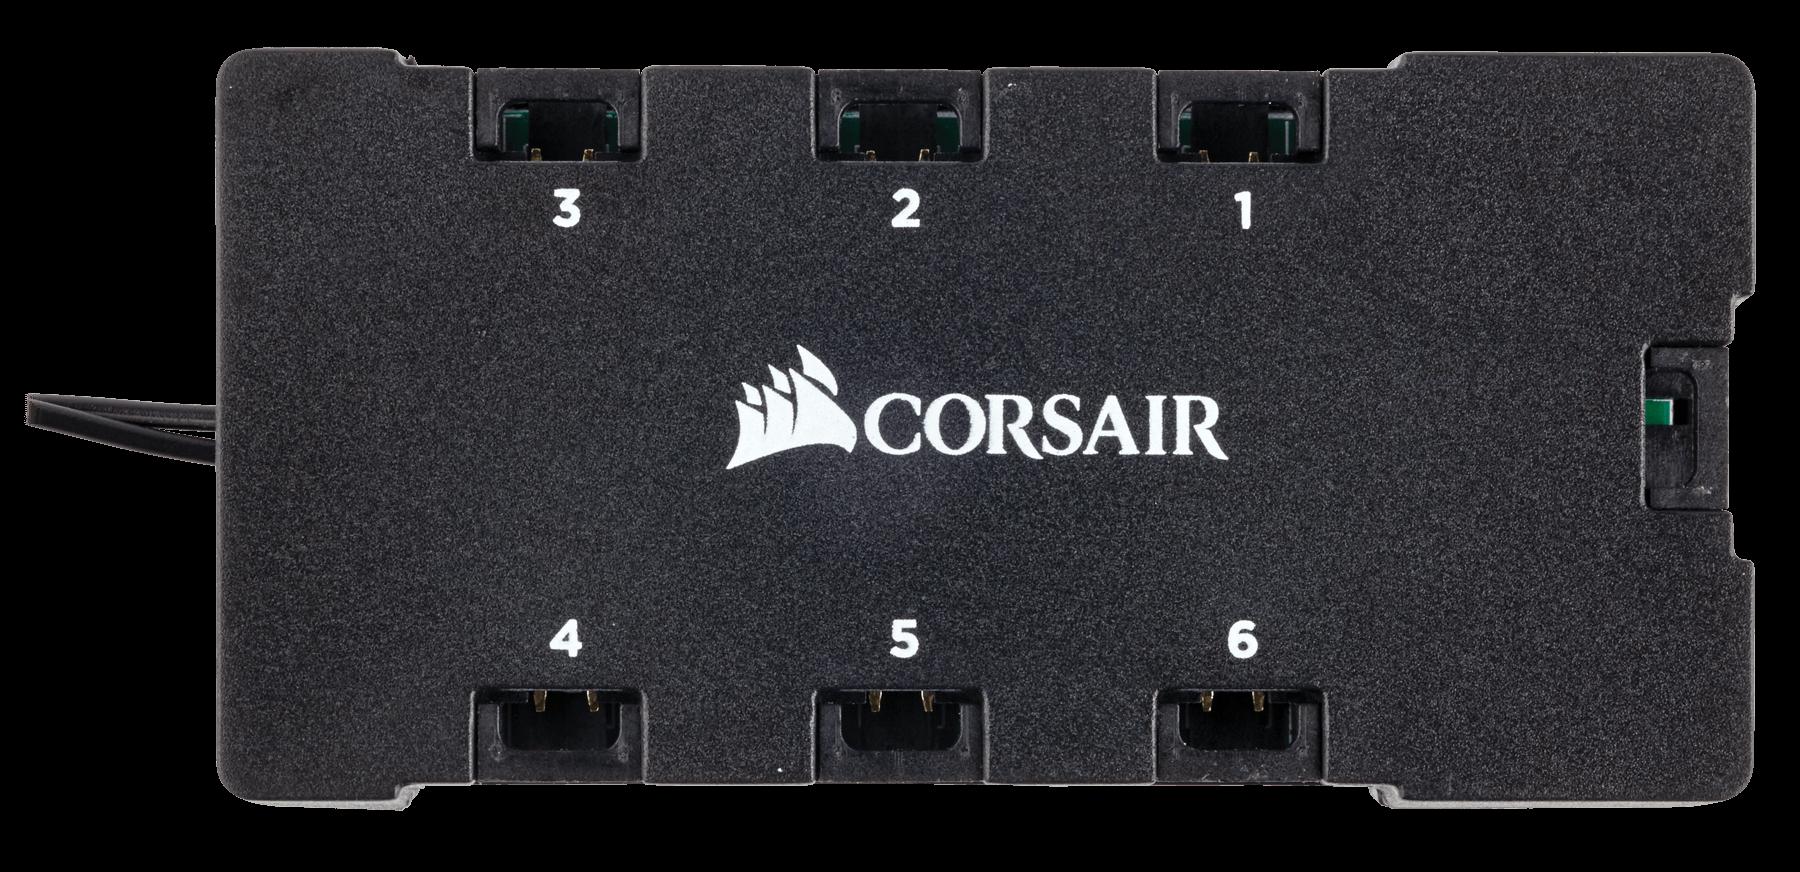 Fan Corsair LL120 RGB 120mm Dual Light Loop RGB LED PWM Fan (Gồm 3 Fan với Lighting Node PRO) (CO-9050072-WW) 2